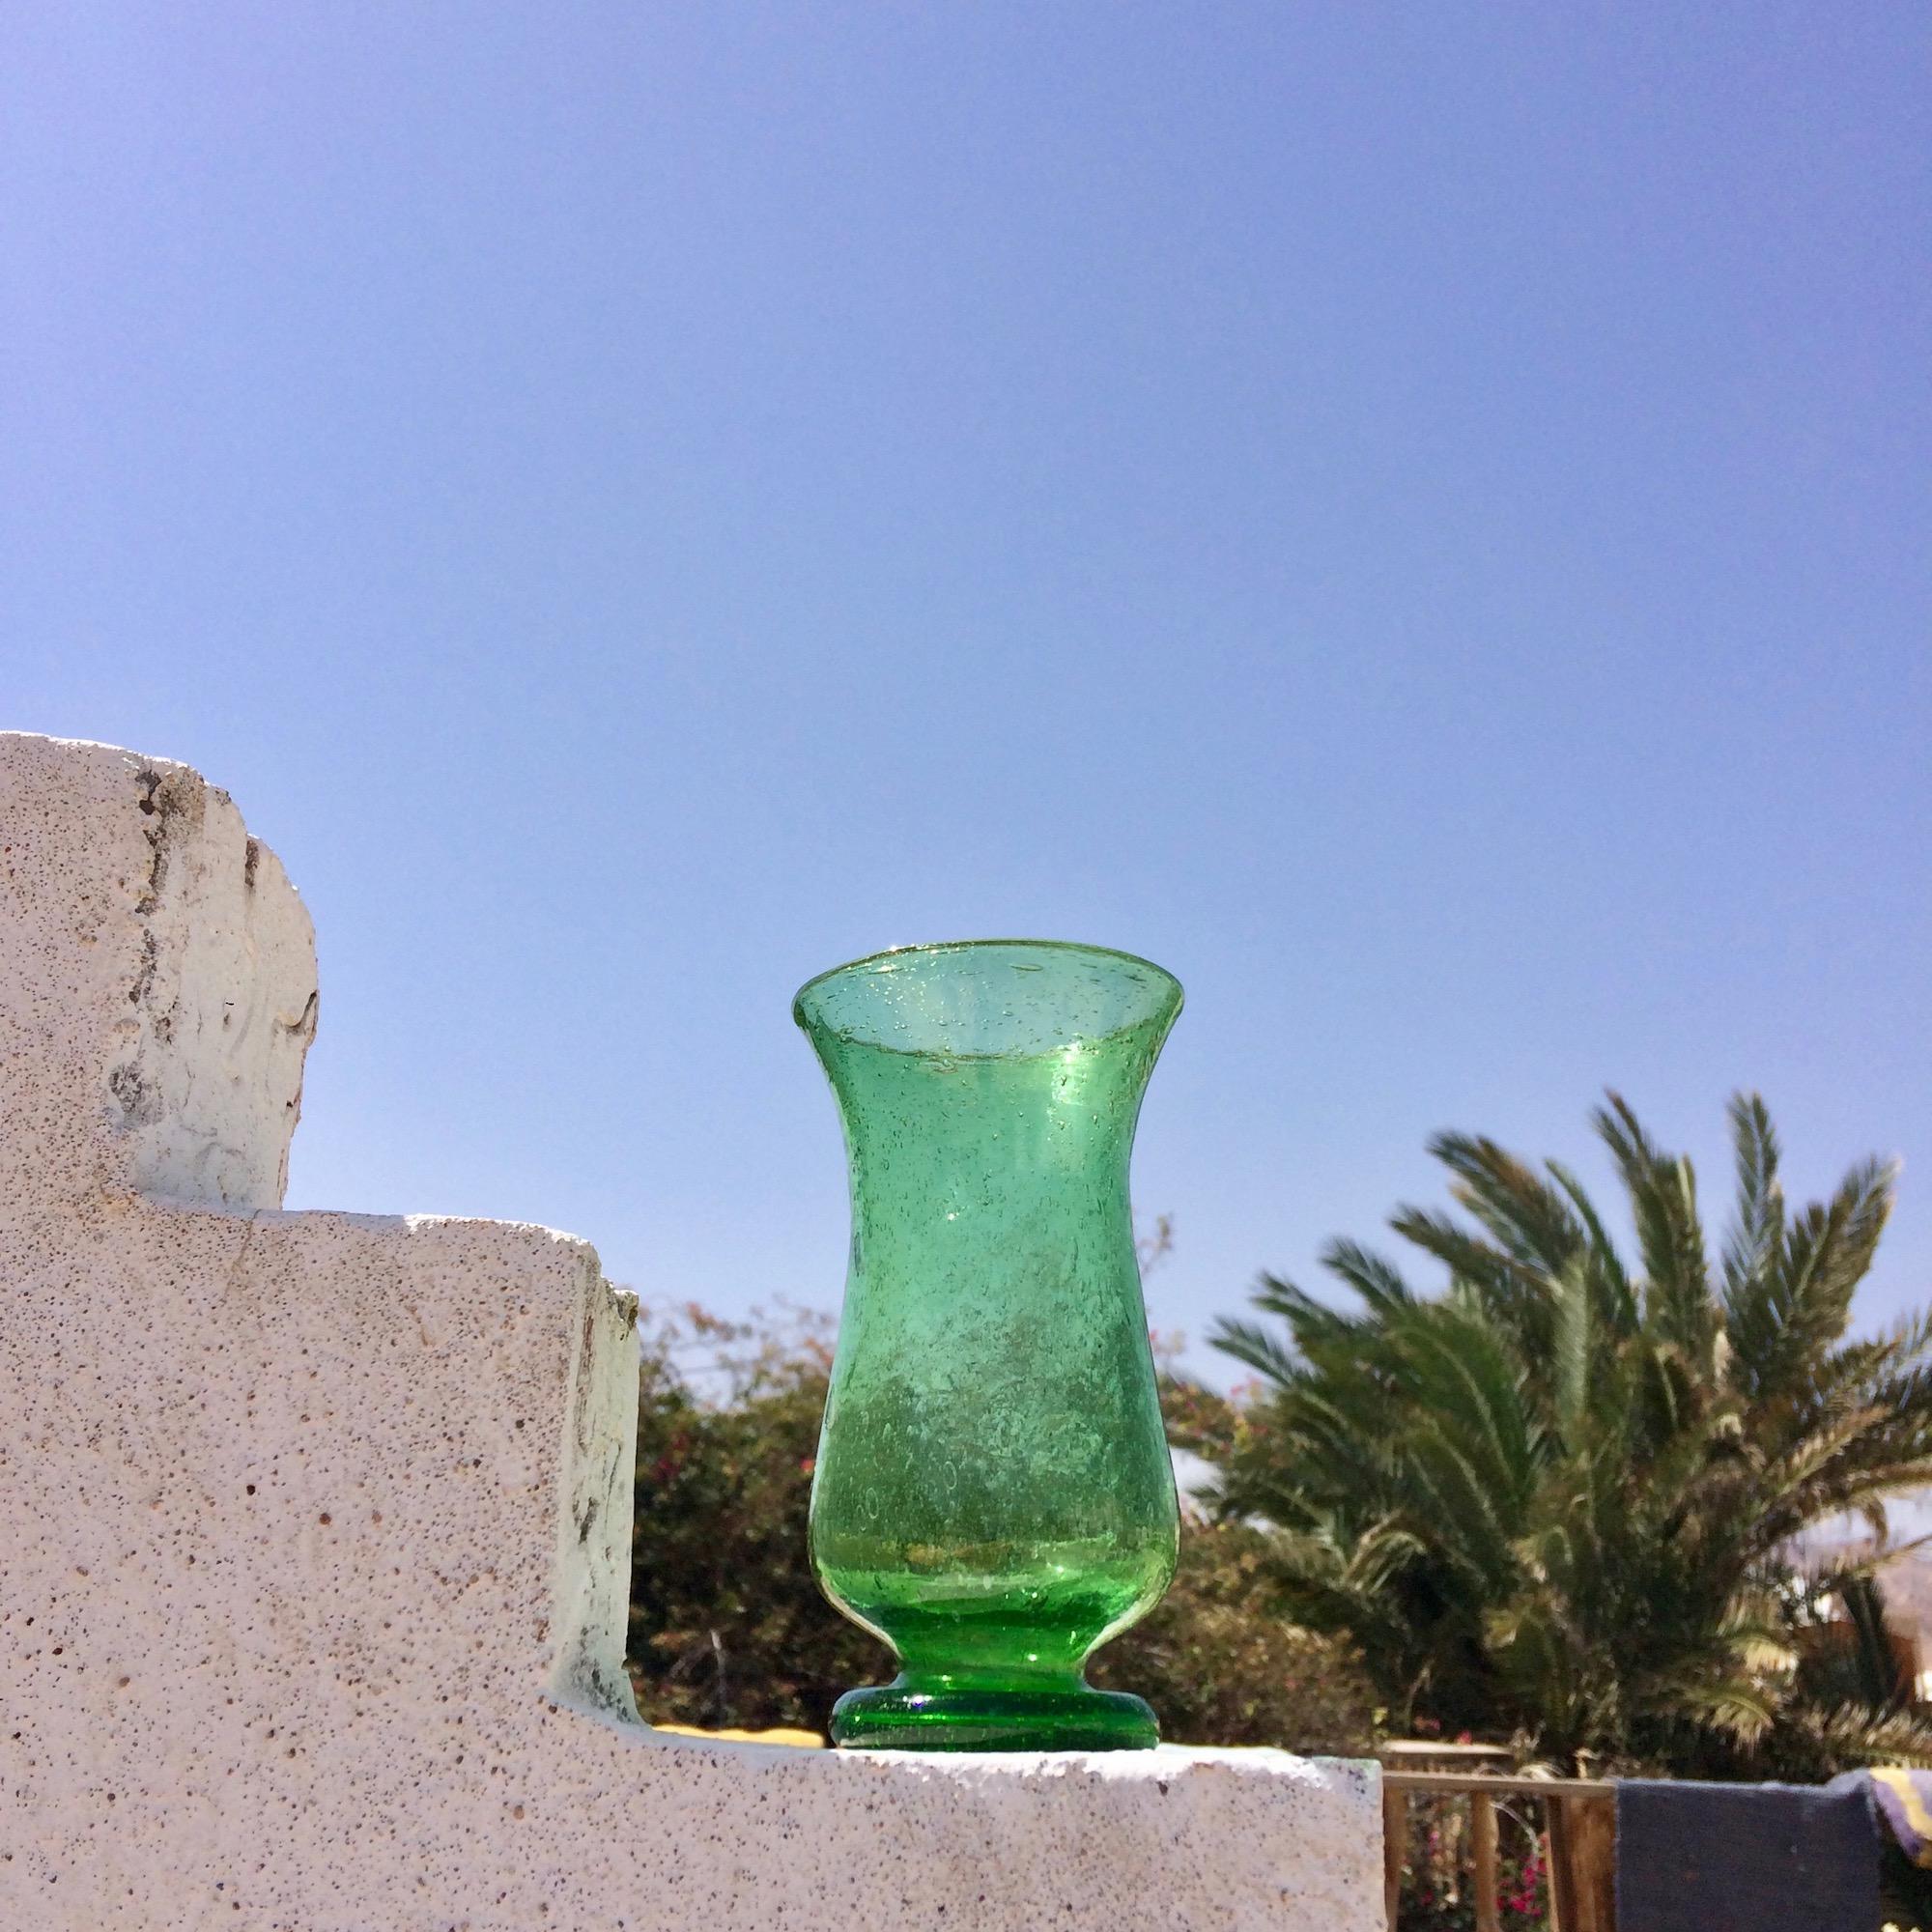 Egyptian Handblown Green Glass Vase